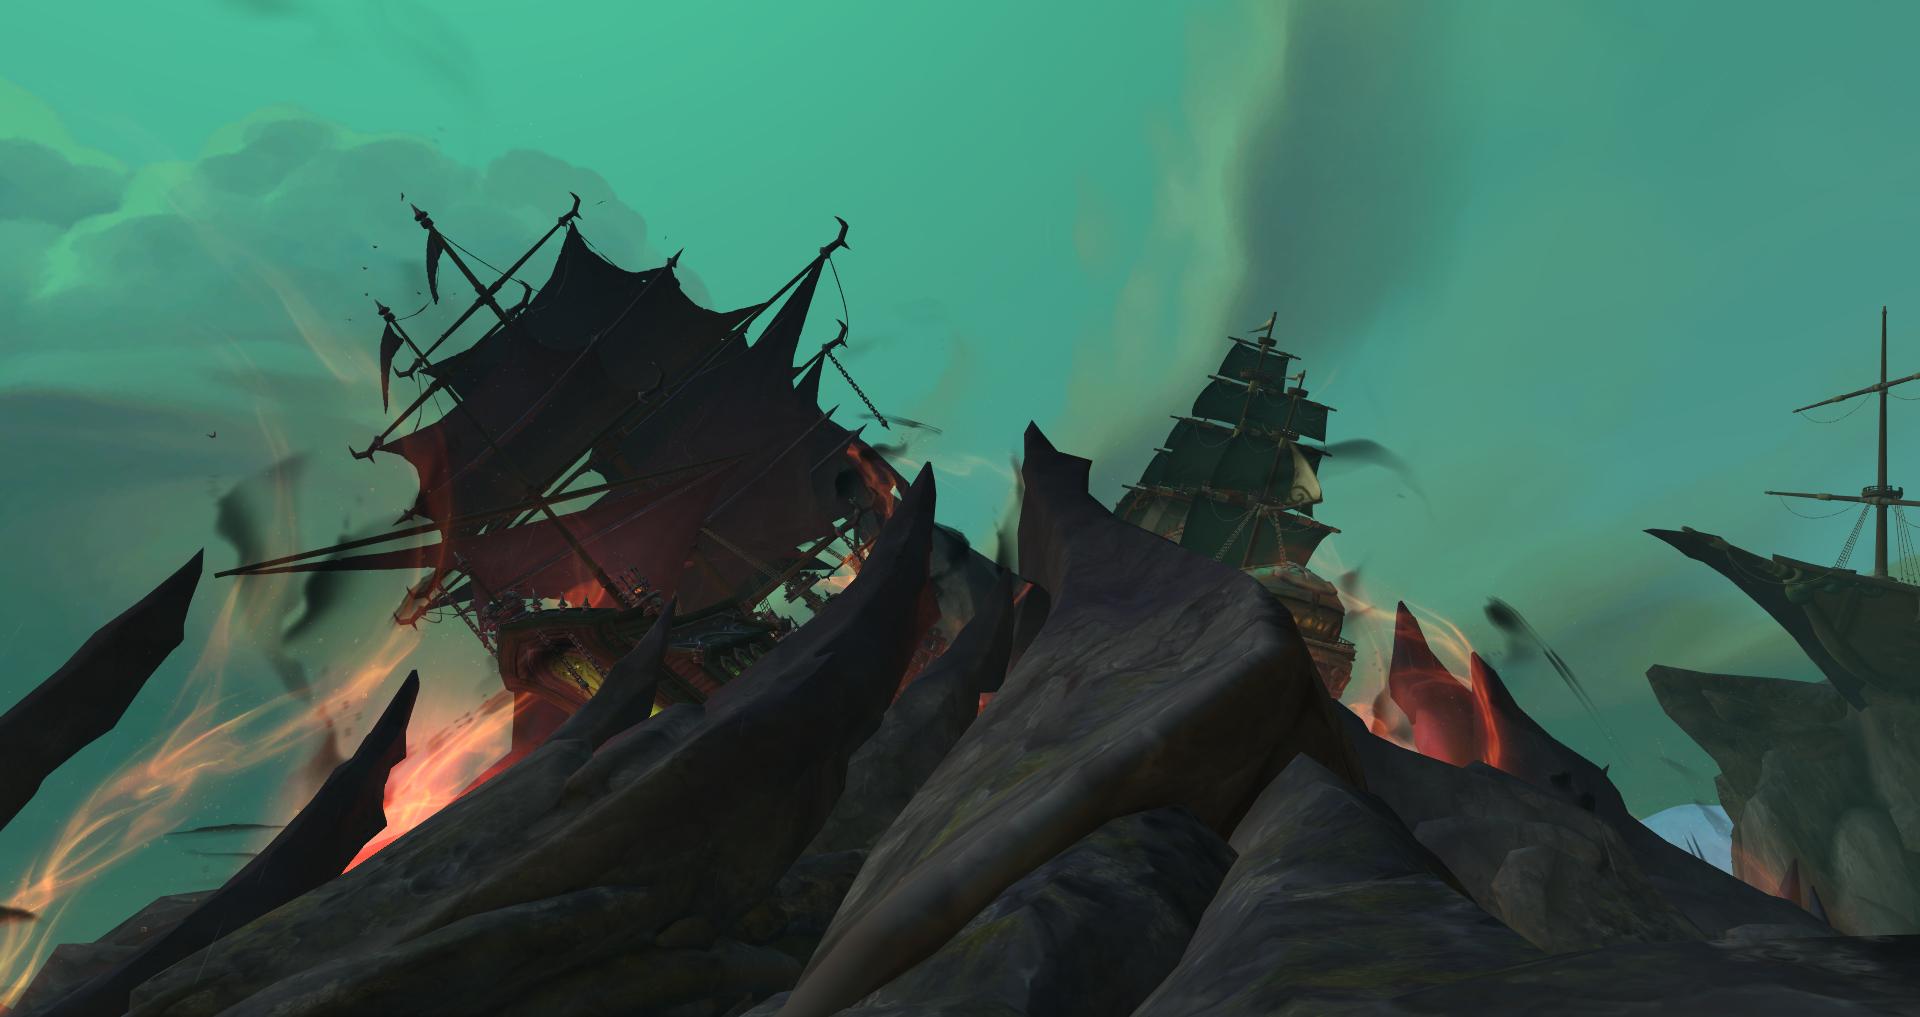 Primeras impresiones de Nazjatar (vista previa) | Hogar del Imperio Naga